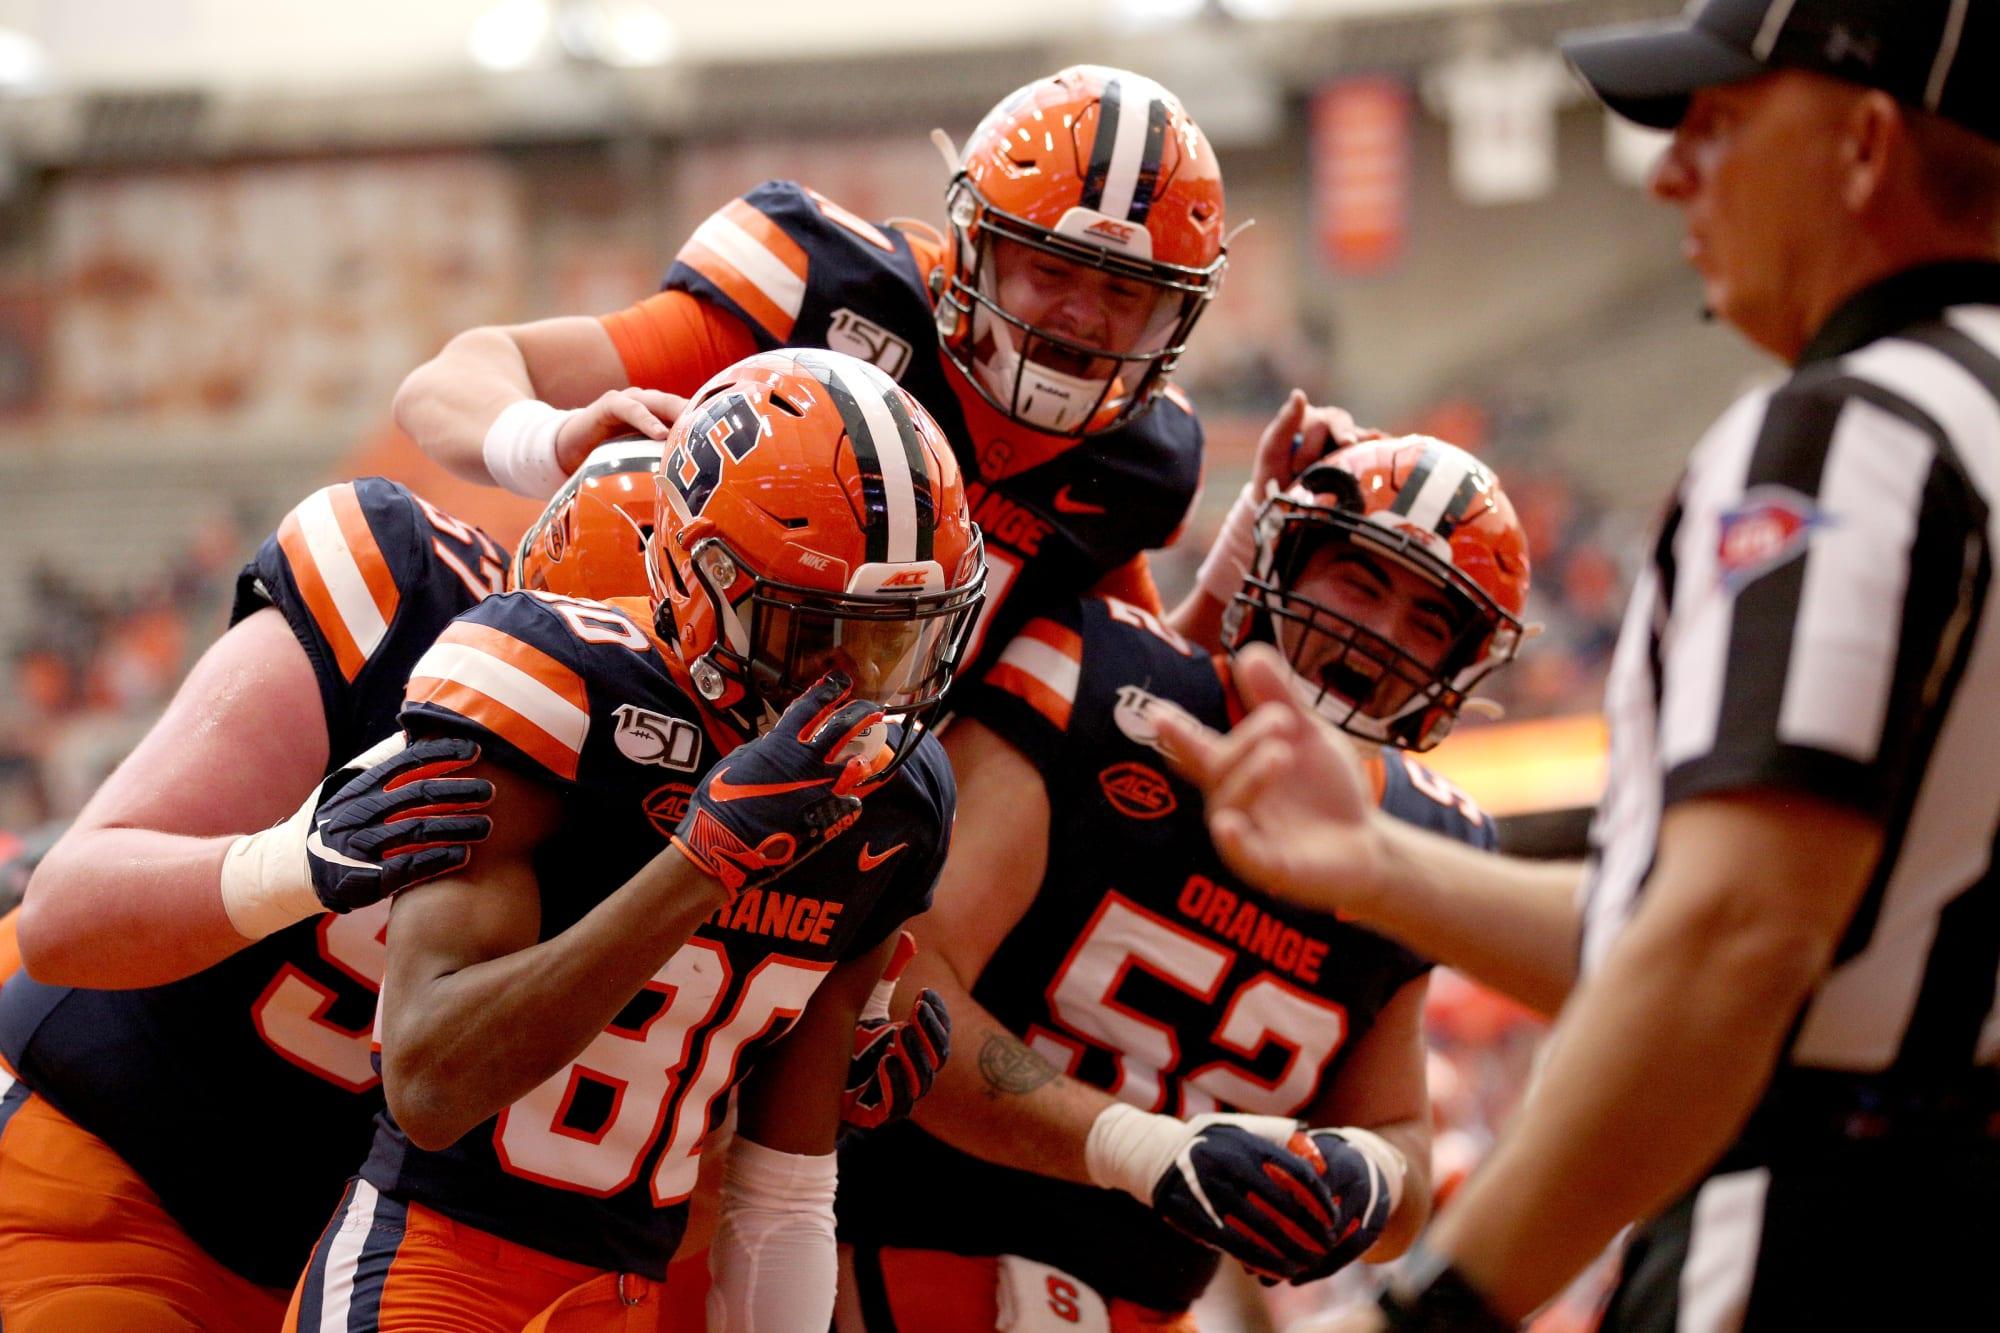 Chase Brice Clemson Tigers Football Jersey Orange